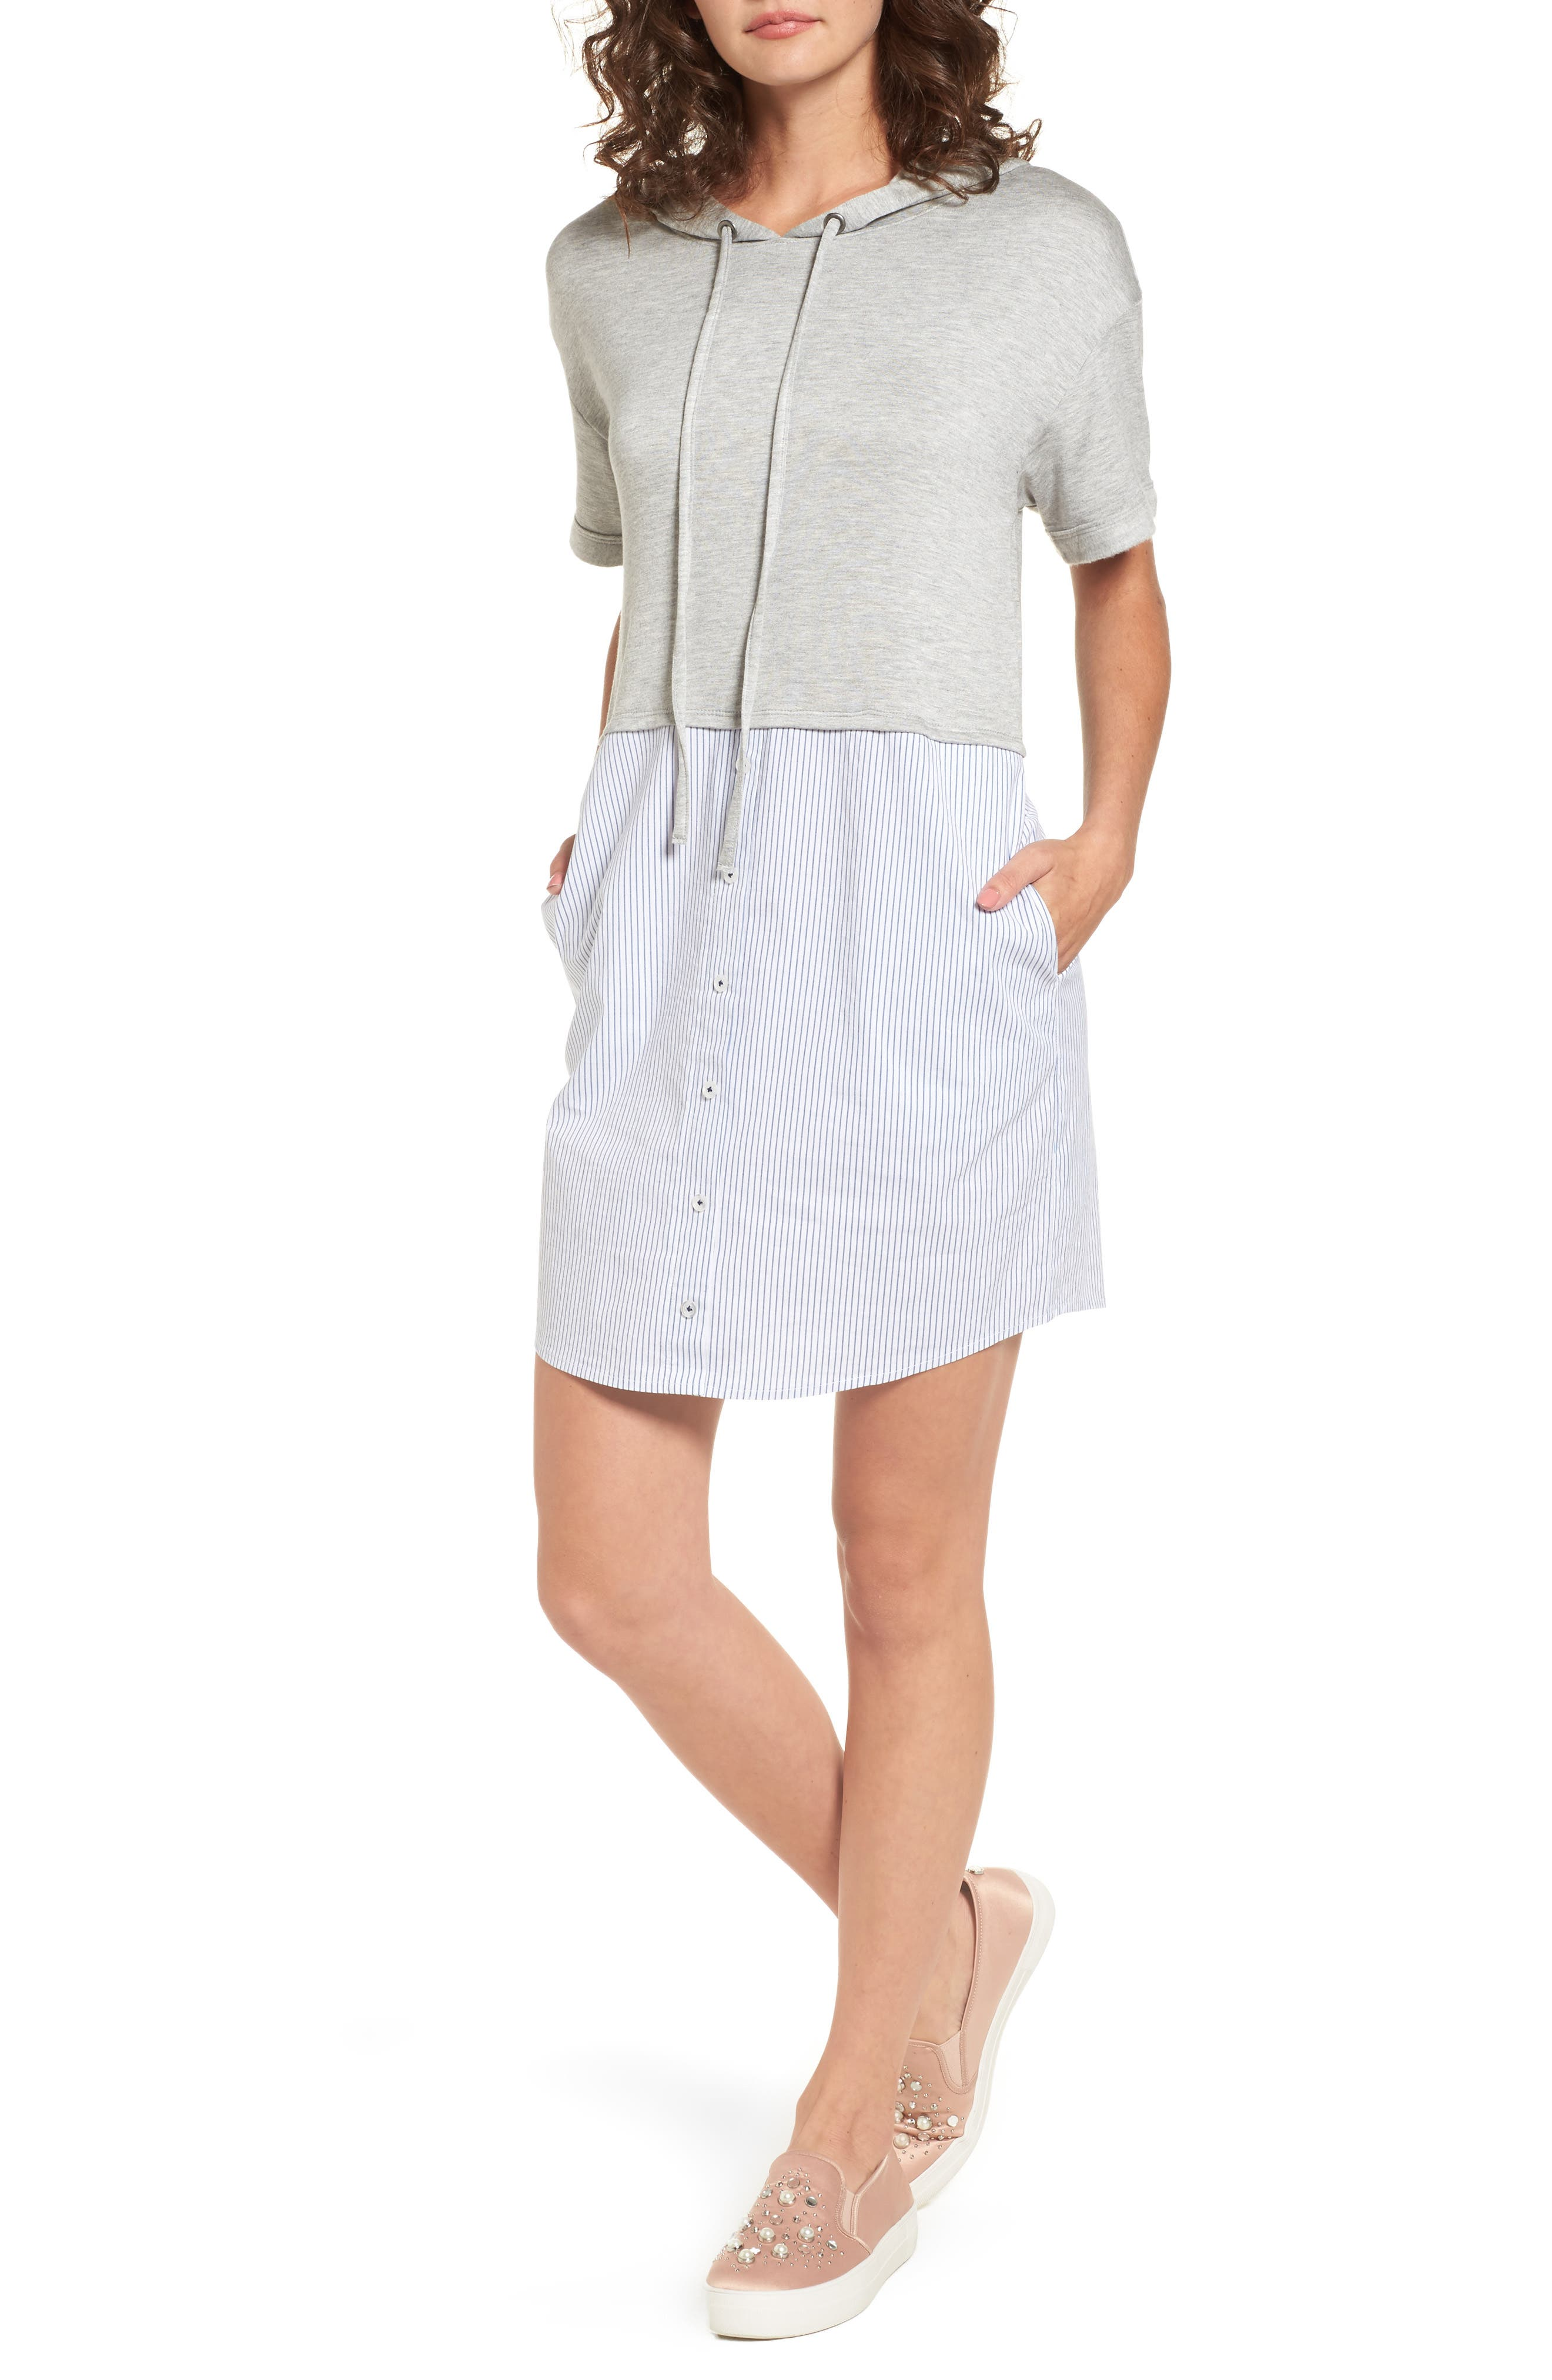 Alternate Image 1 Selected - Socialite Mixed Media Hoodie Dress